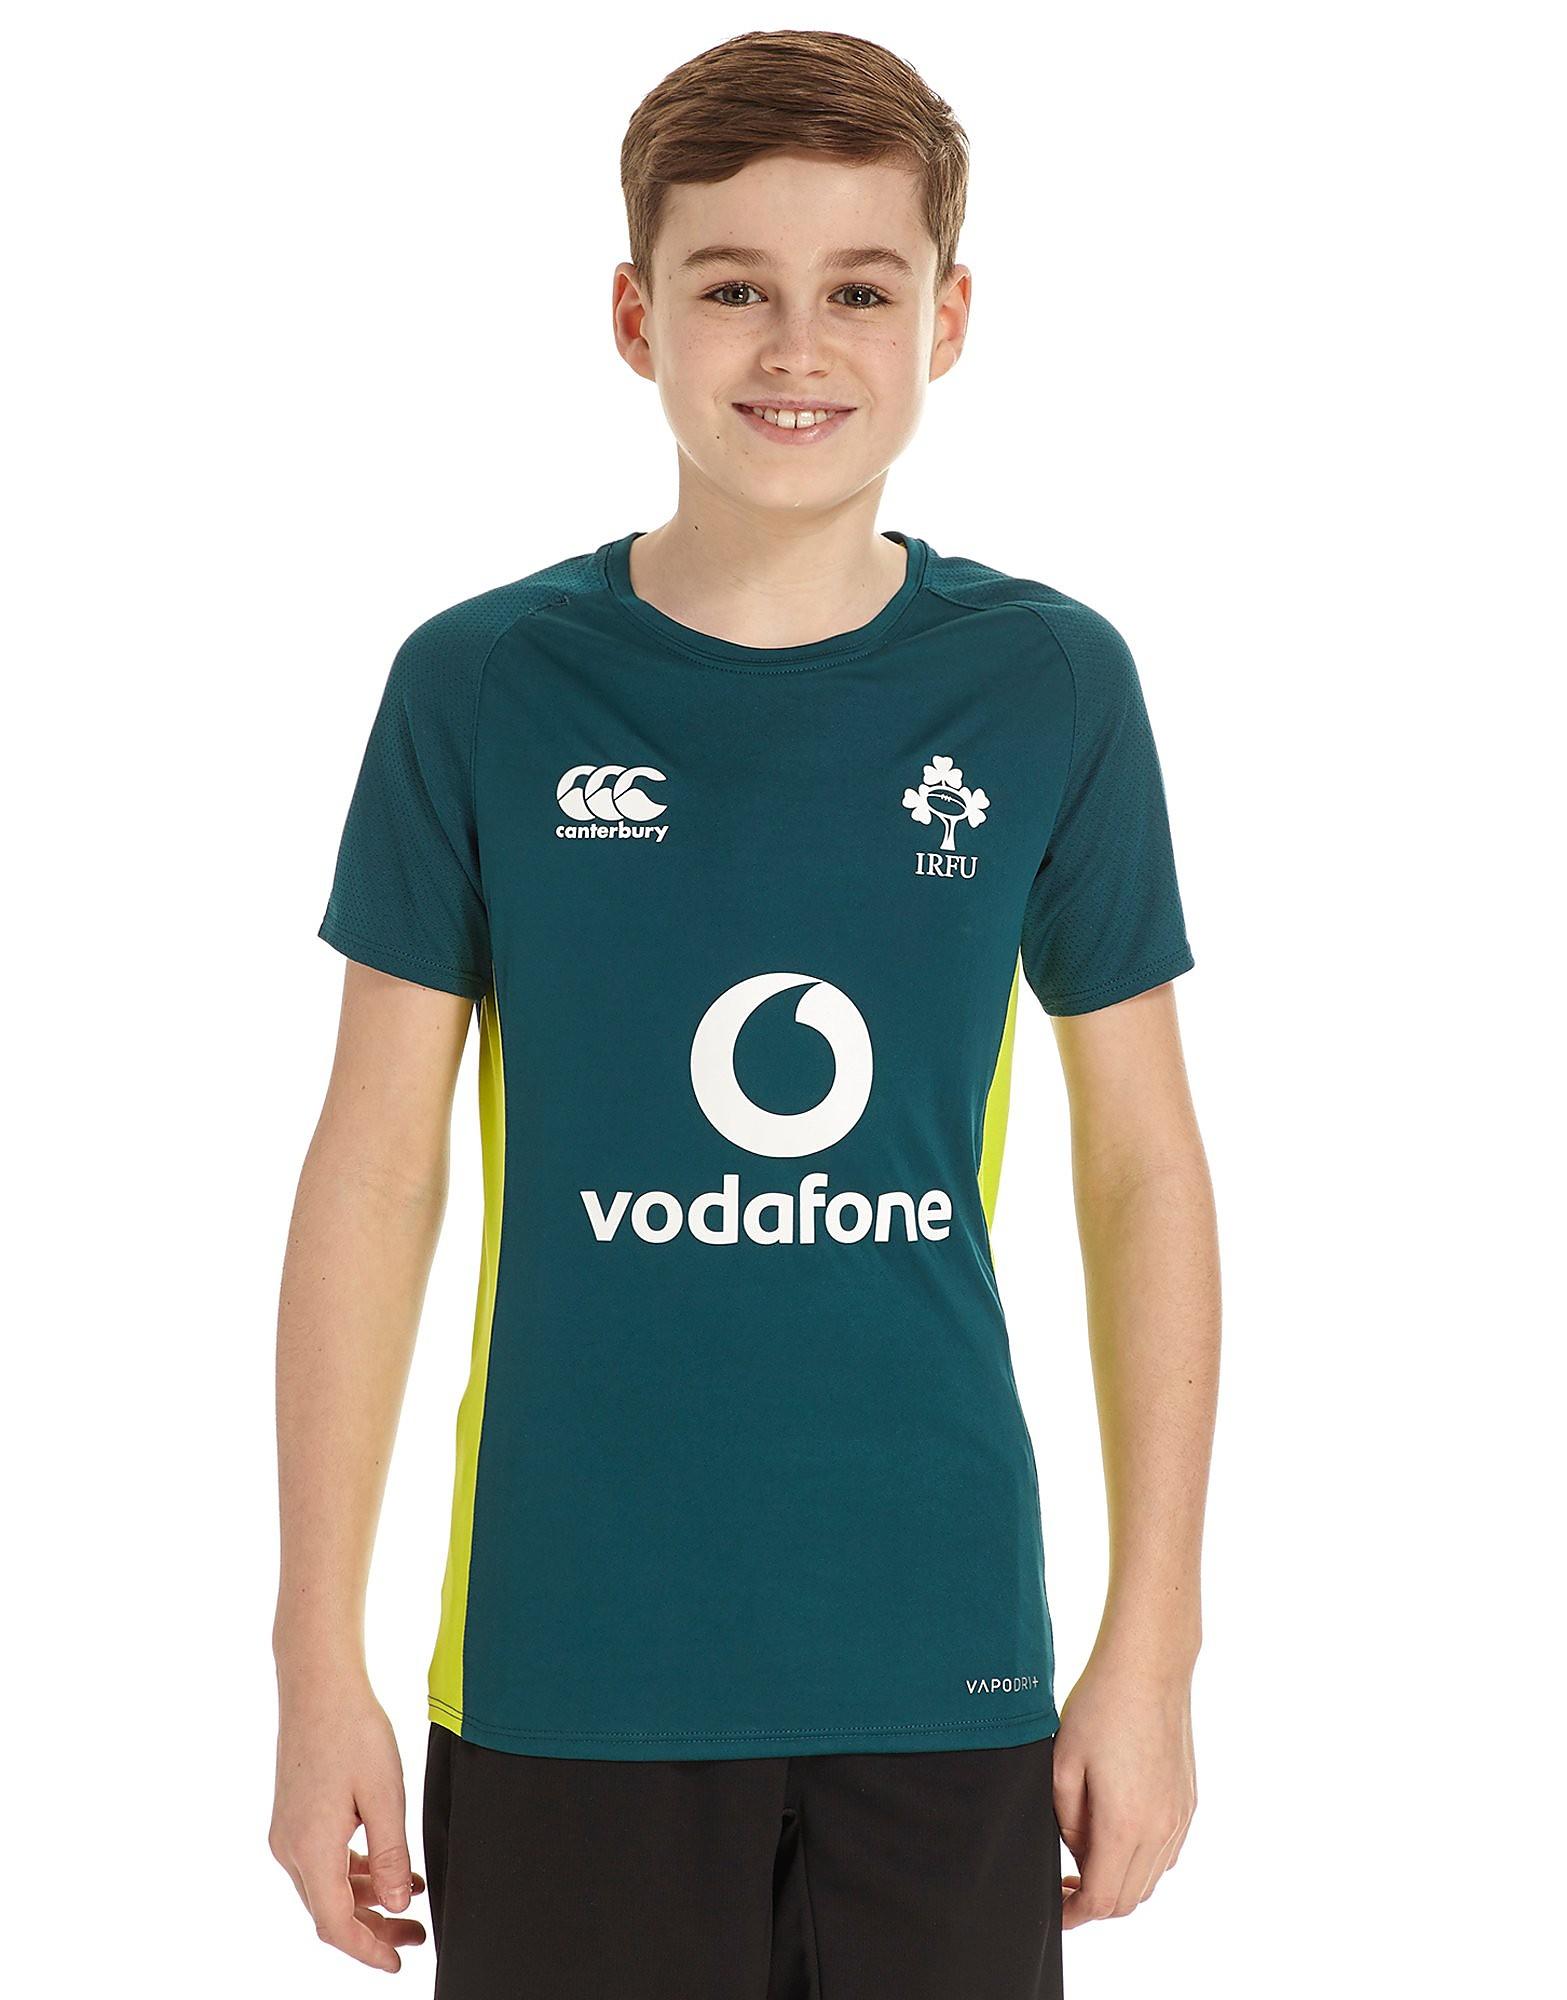 Canterbury Ireland Rugby Vapodri Shirt